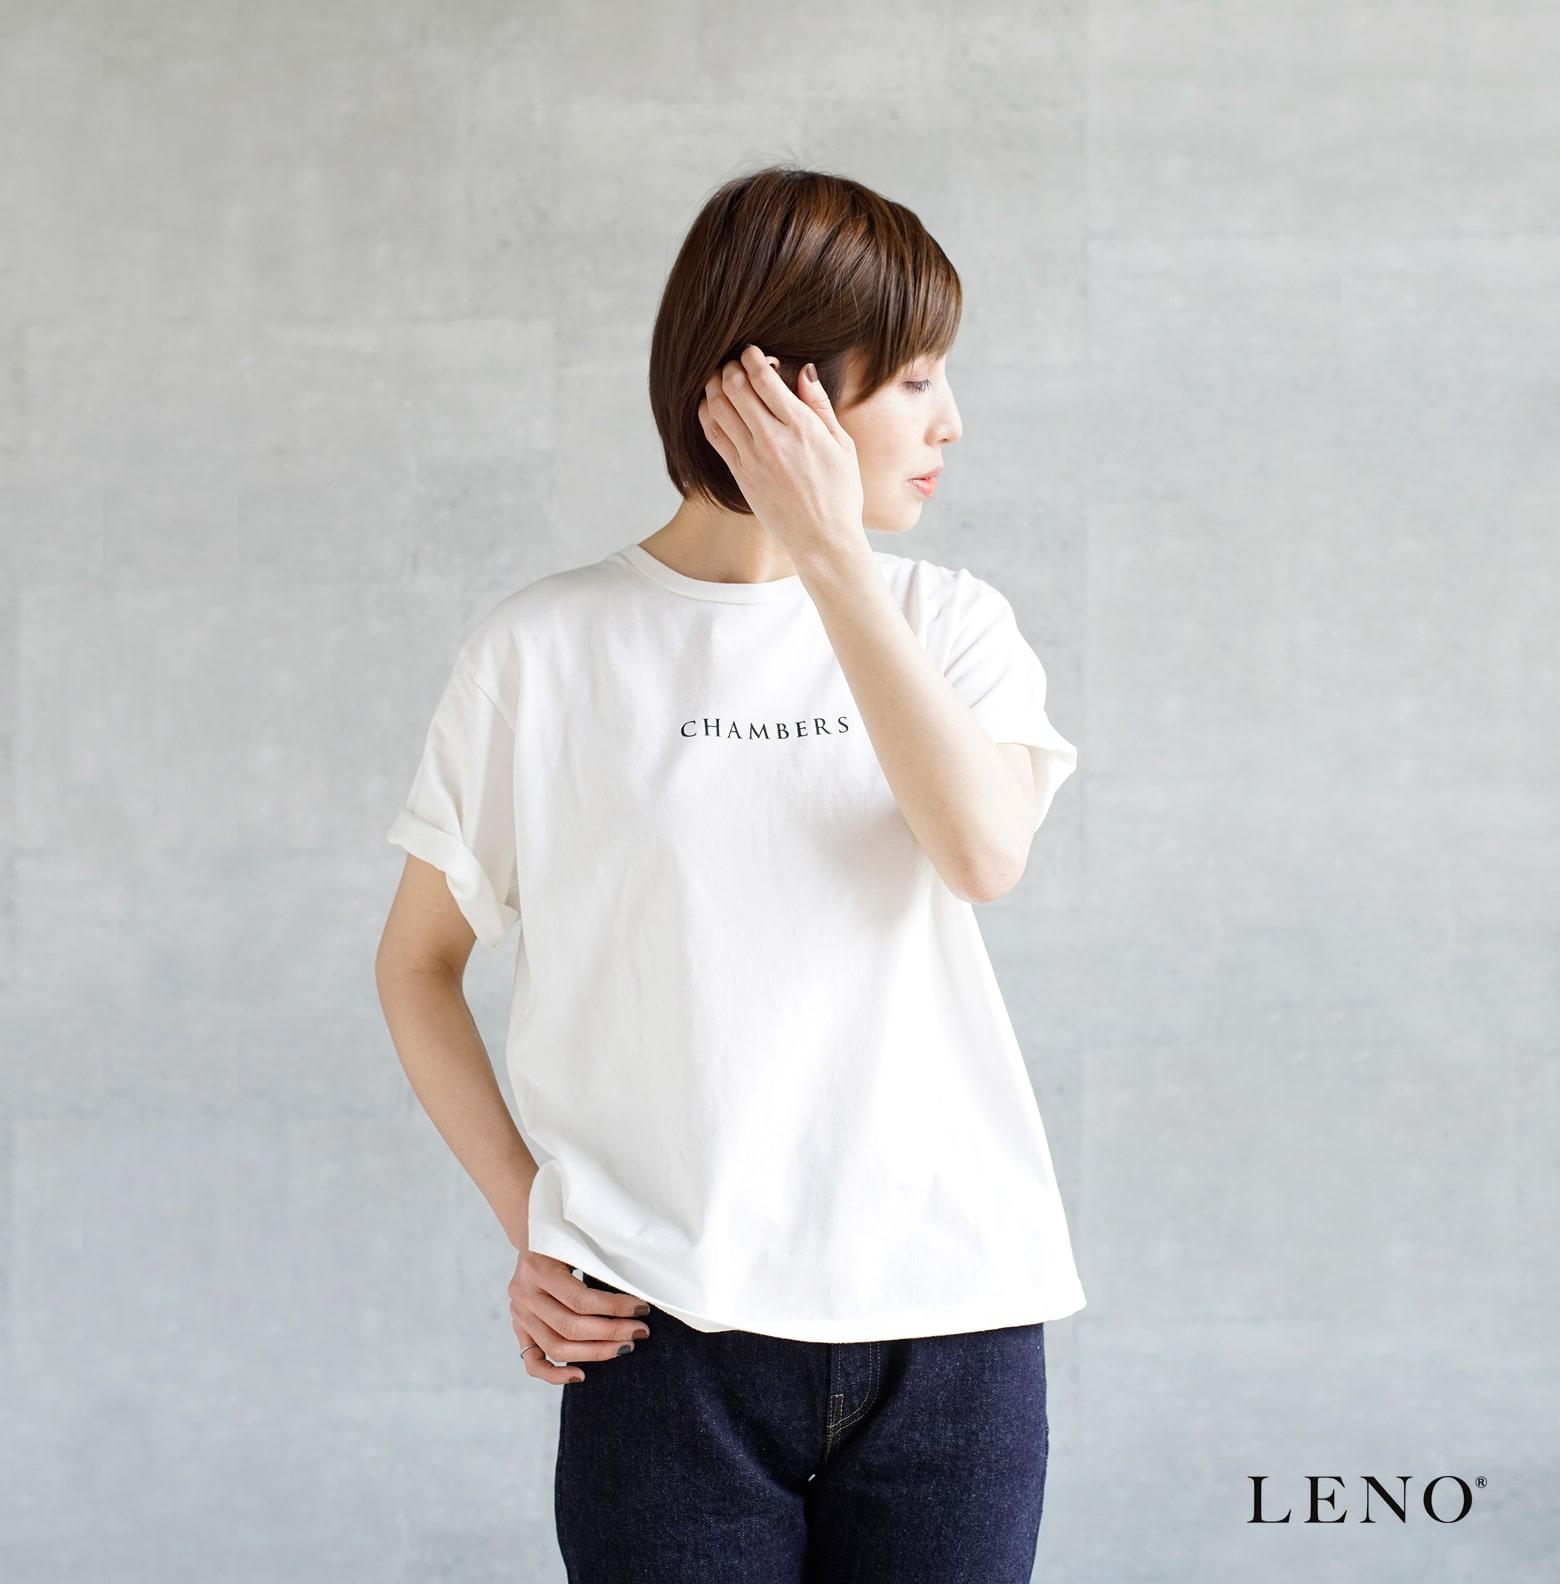 LENO(リノ)プリントTシャツ l1901-u005